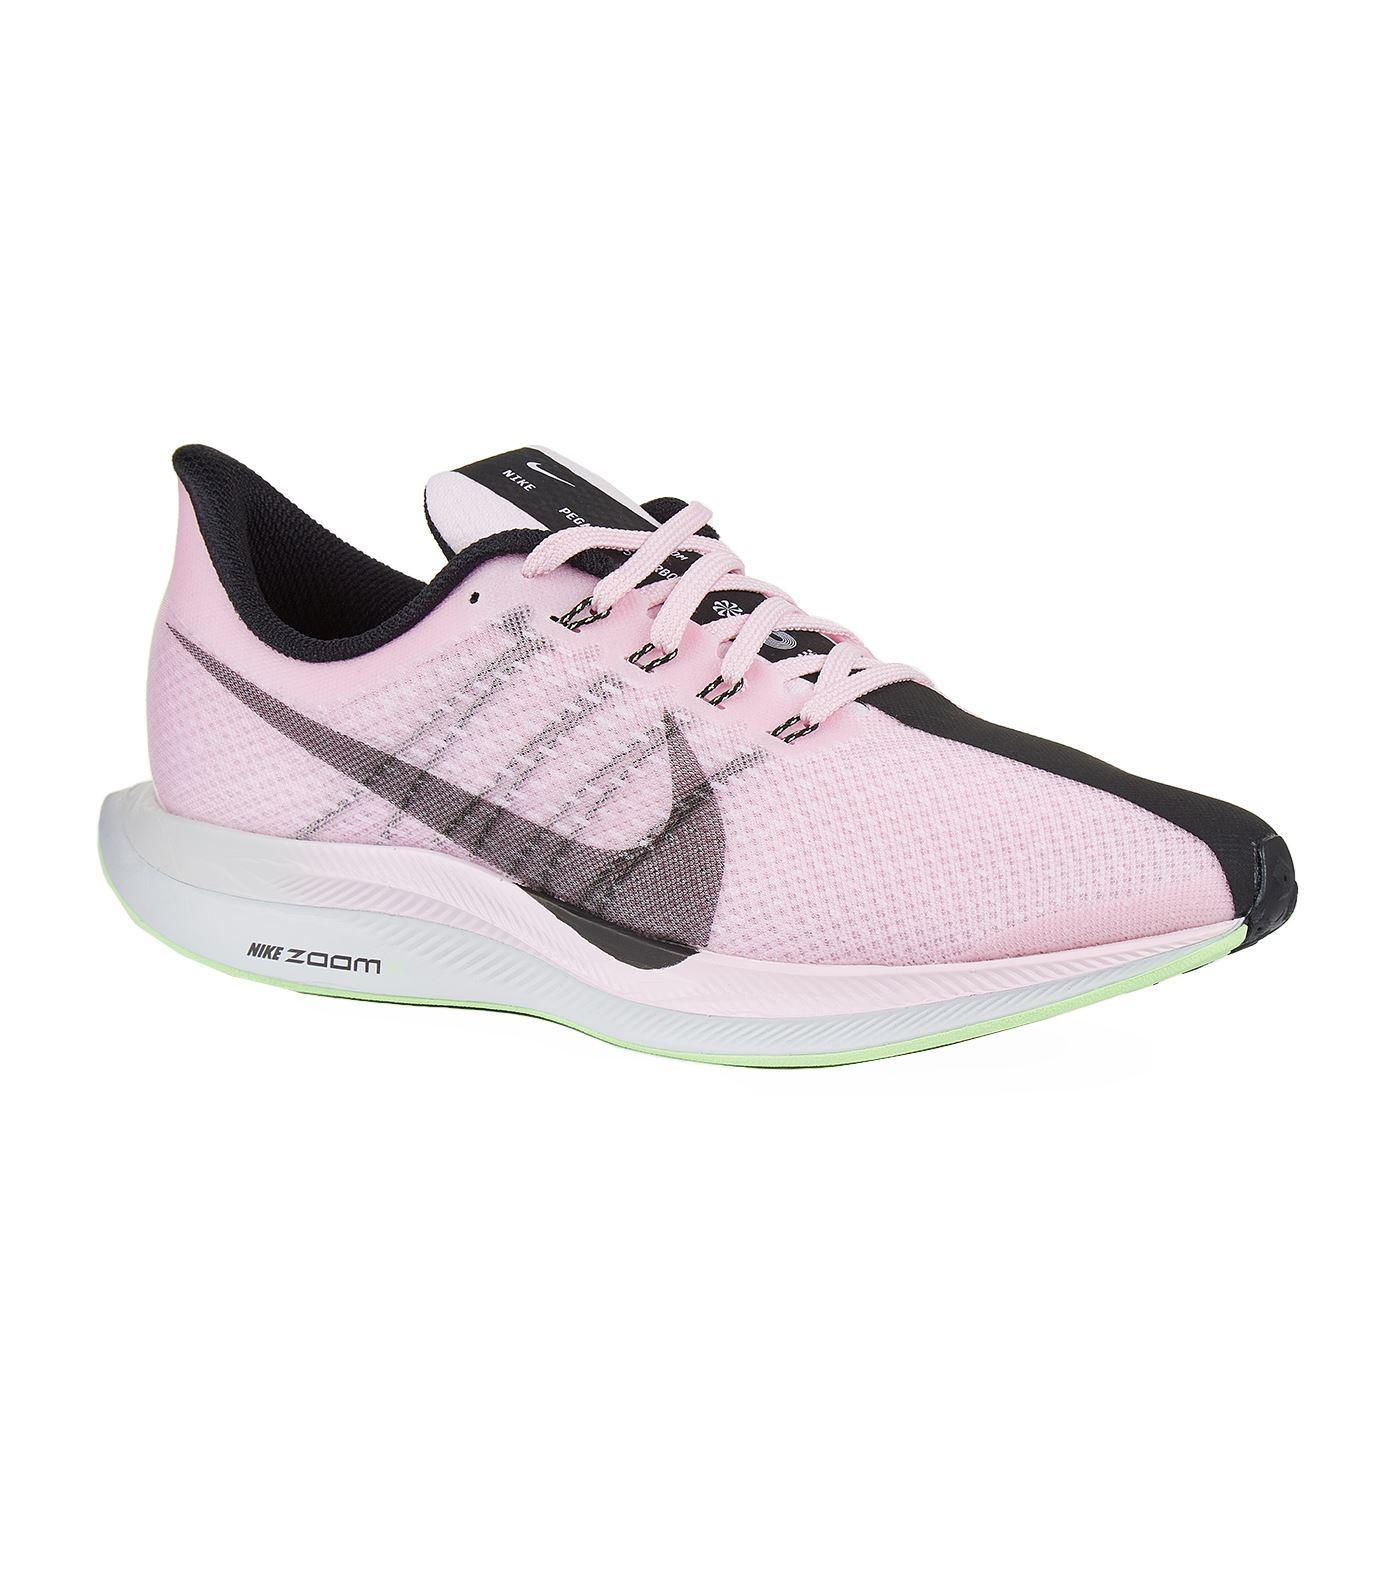 903e6936349d Nike - Pink Air Zoom Pegasus 35 Turbo Trainers - Lyst. View fullscreen